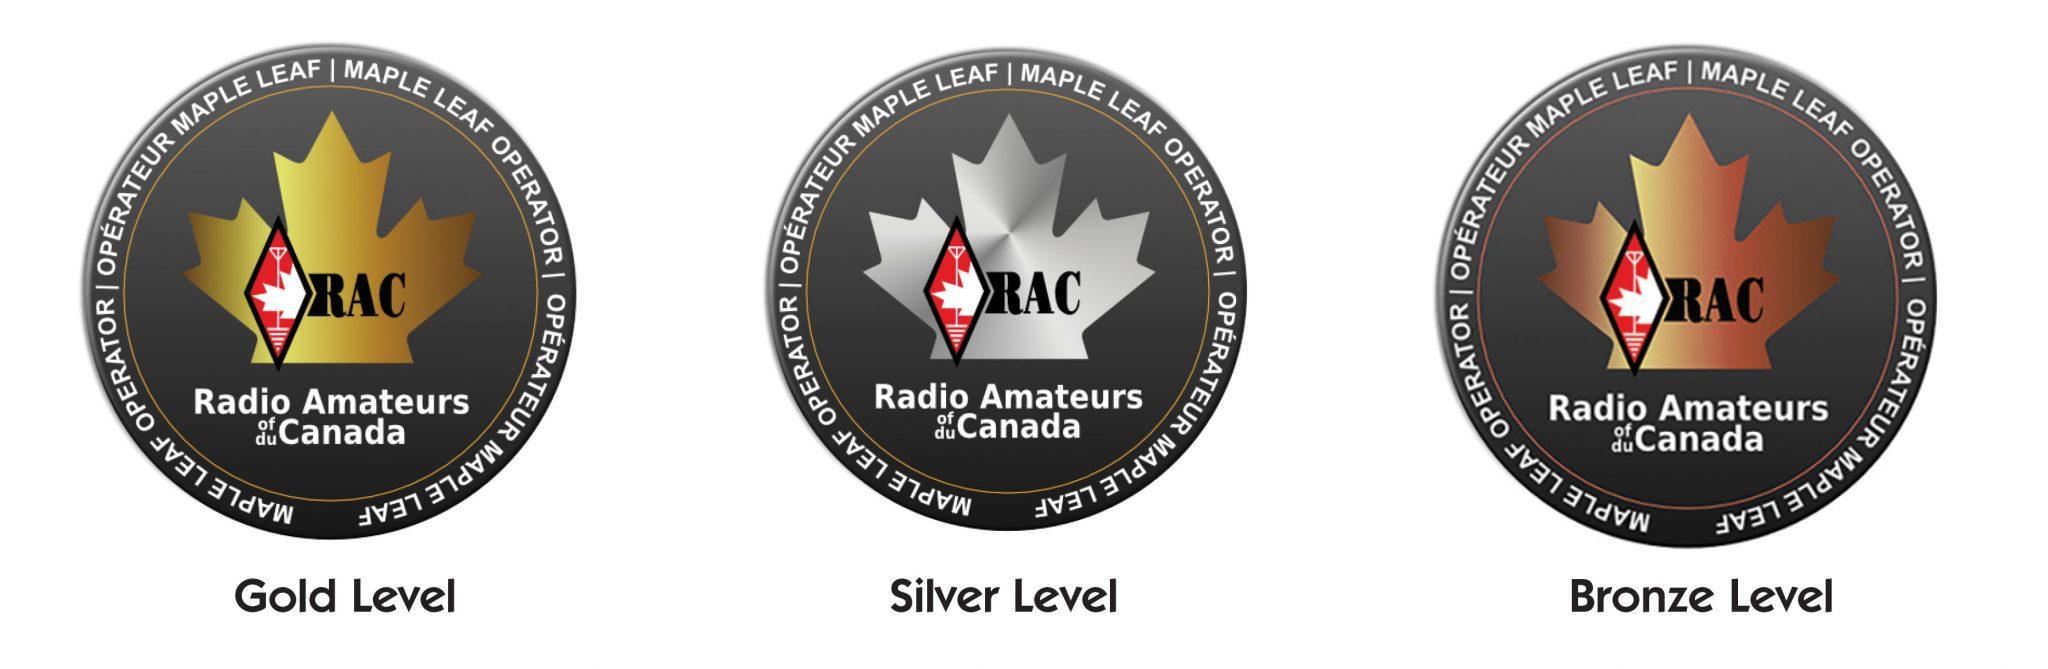 RAC Maple Leaf Operator Member logos